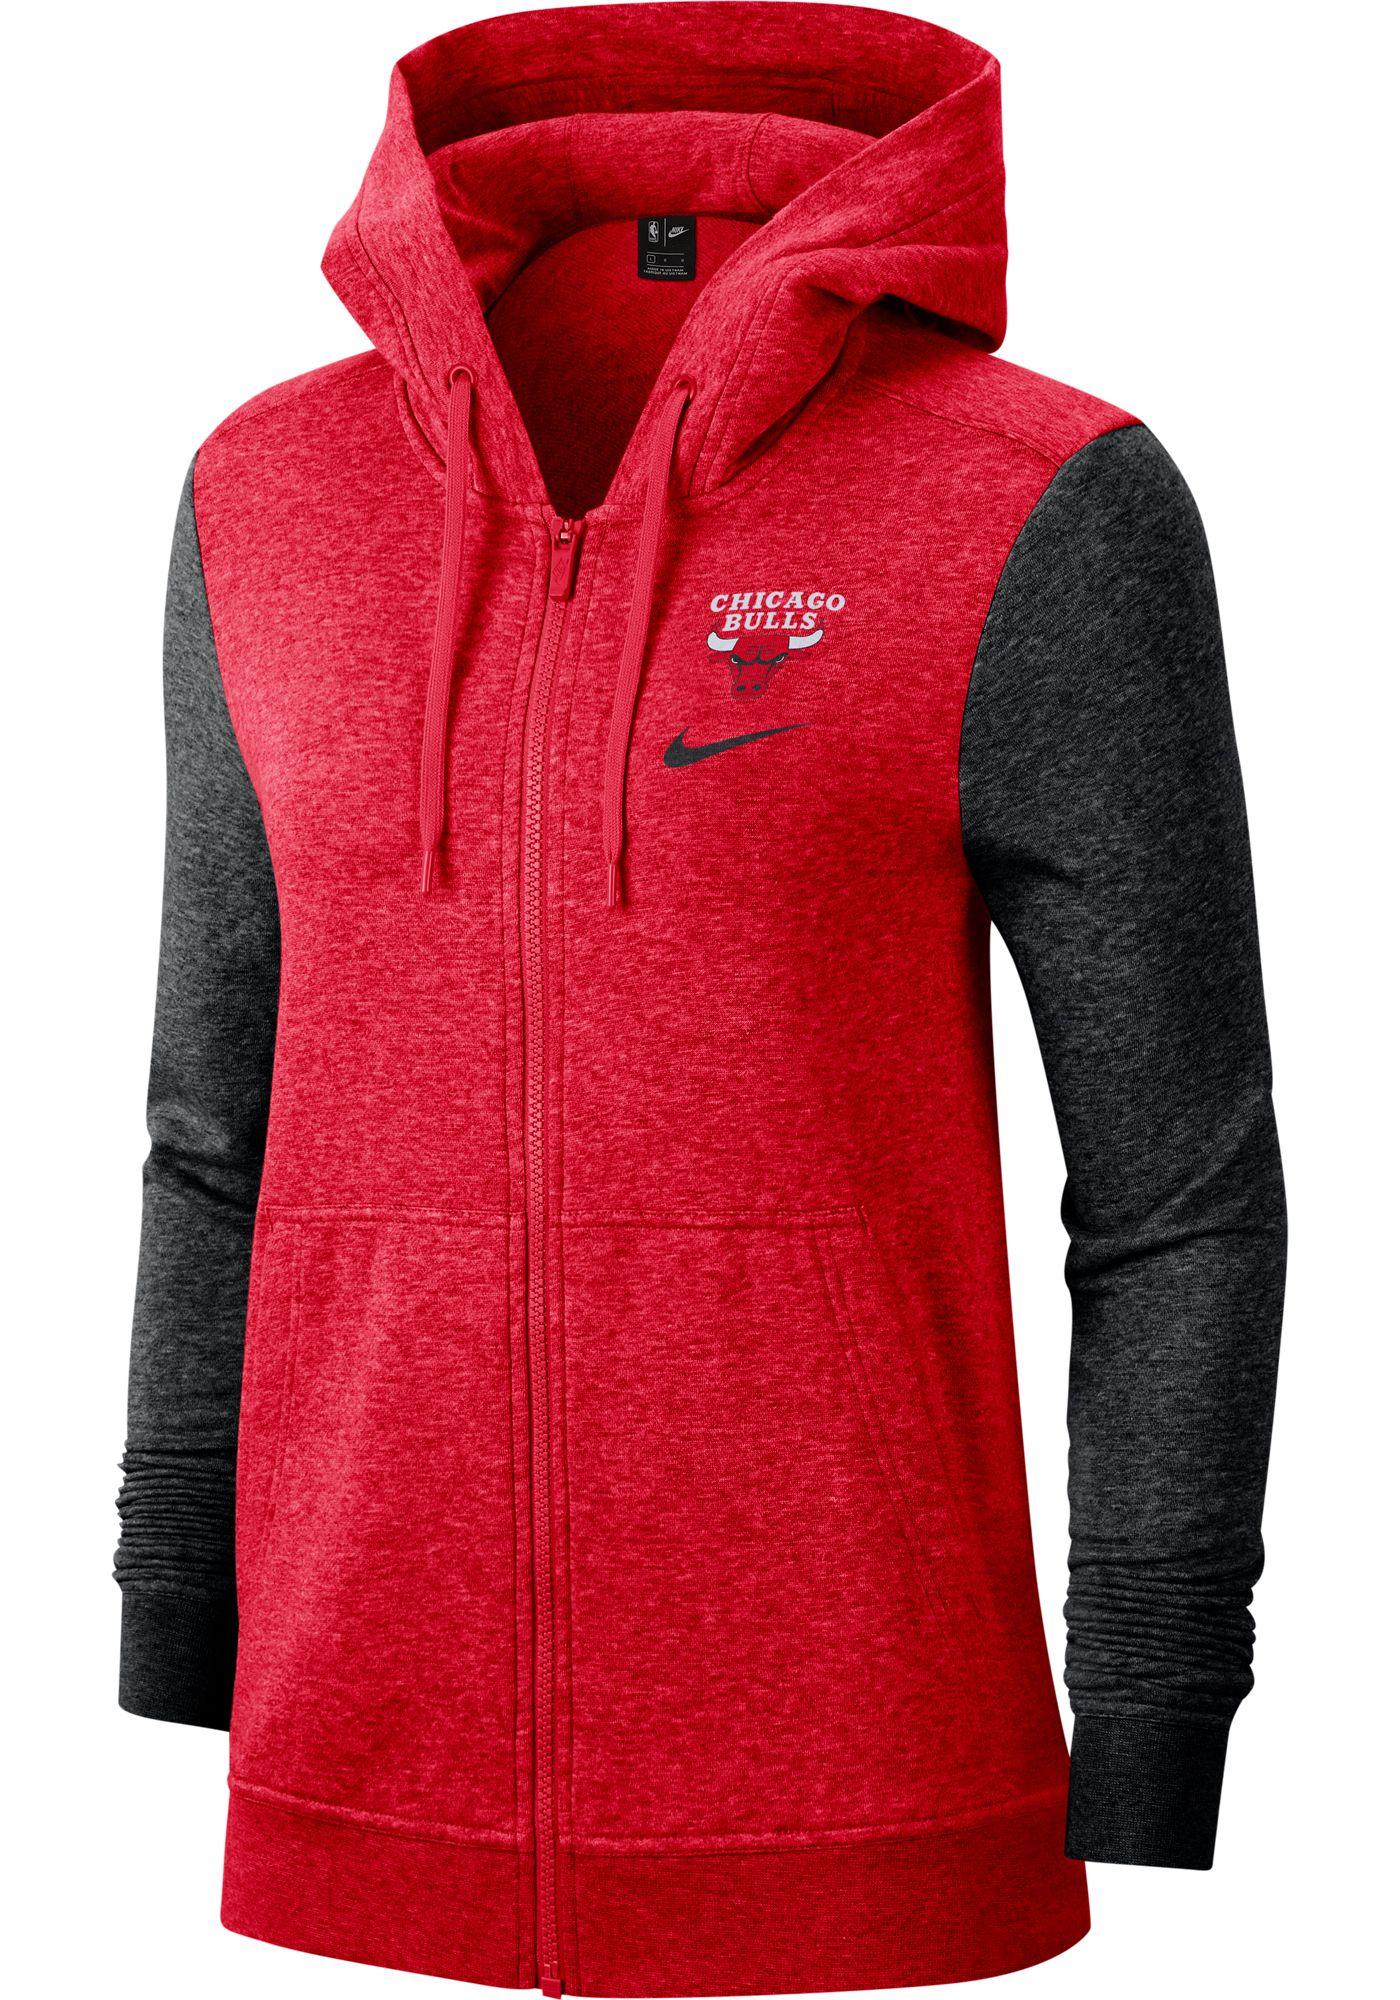 Nike Women's Chicago Bulls Raglan Full-Zip Hoodie